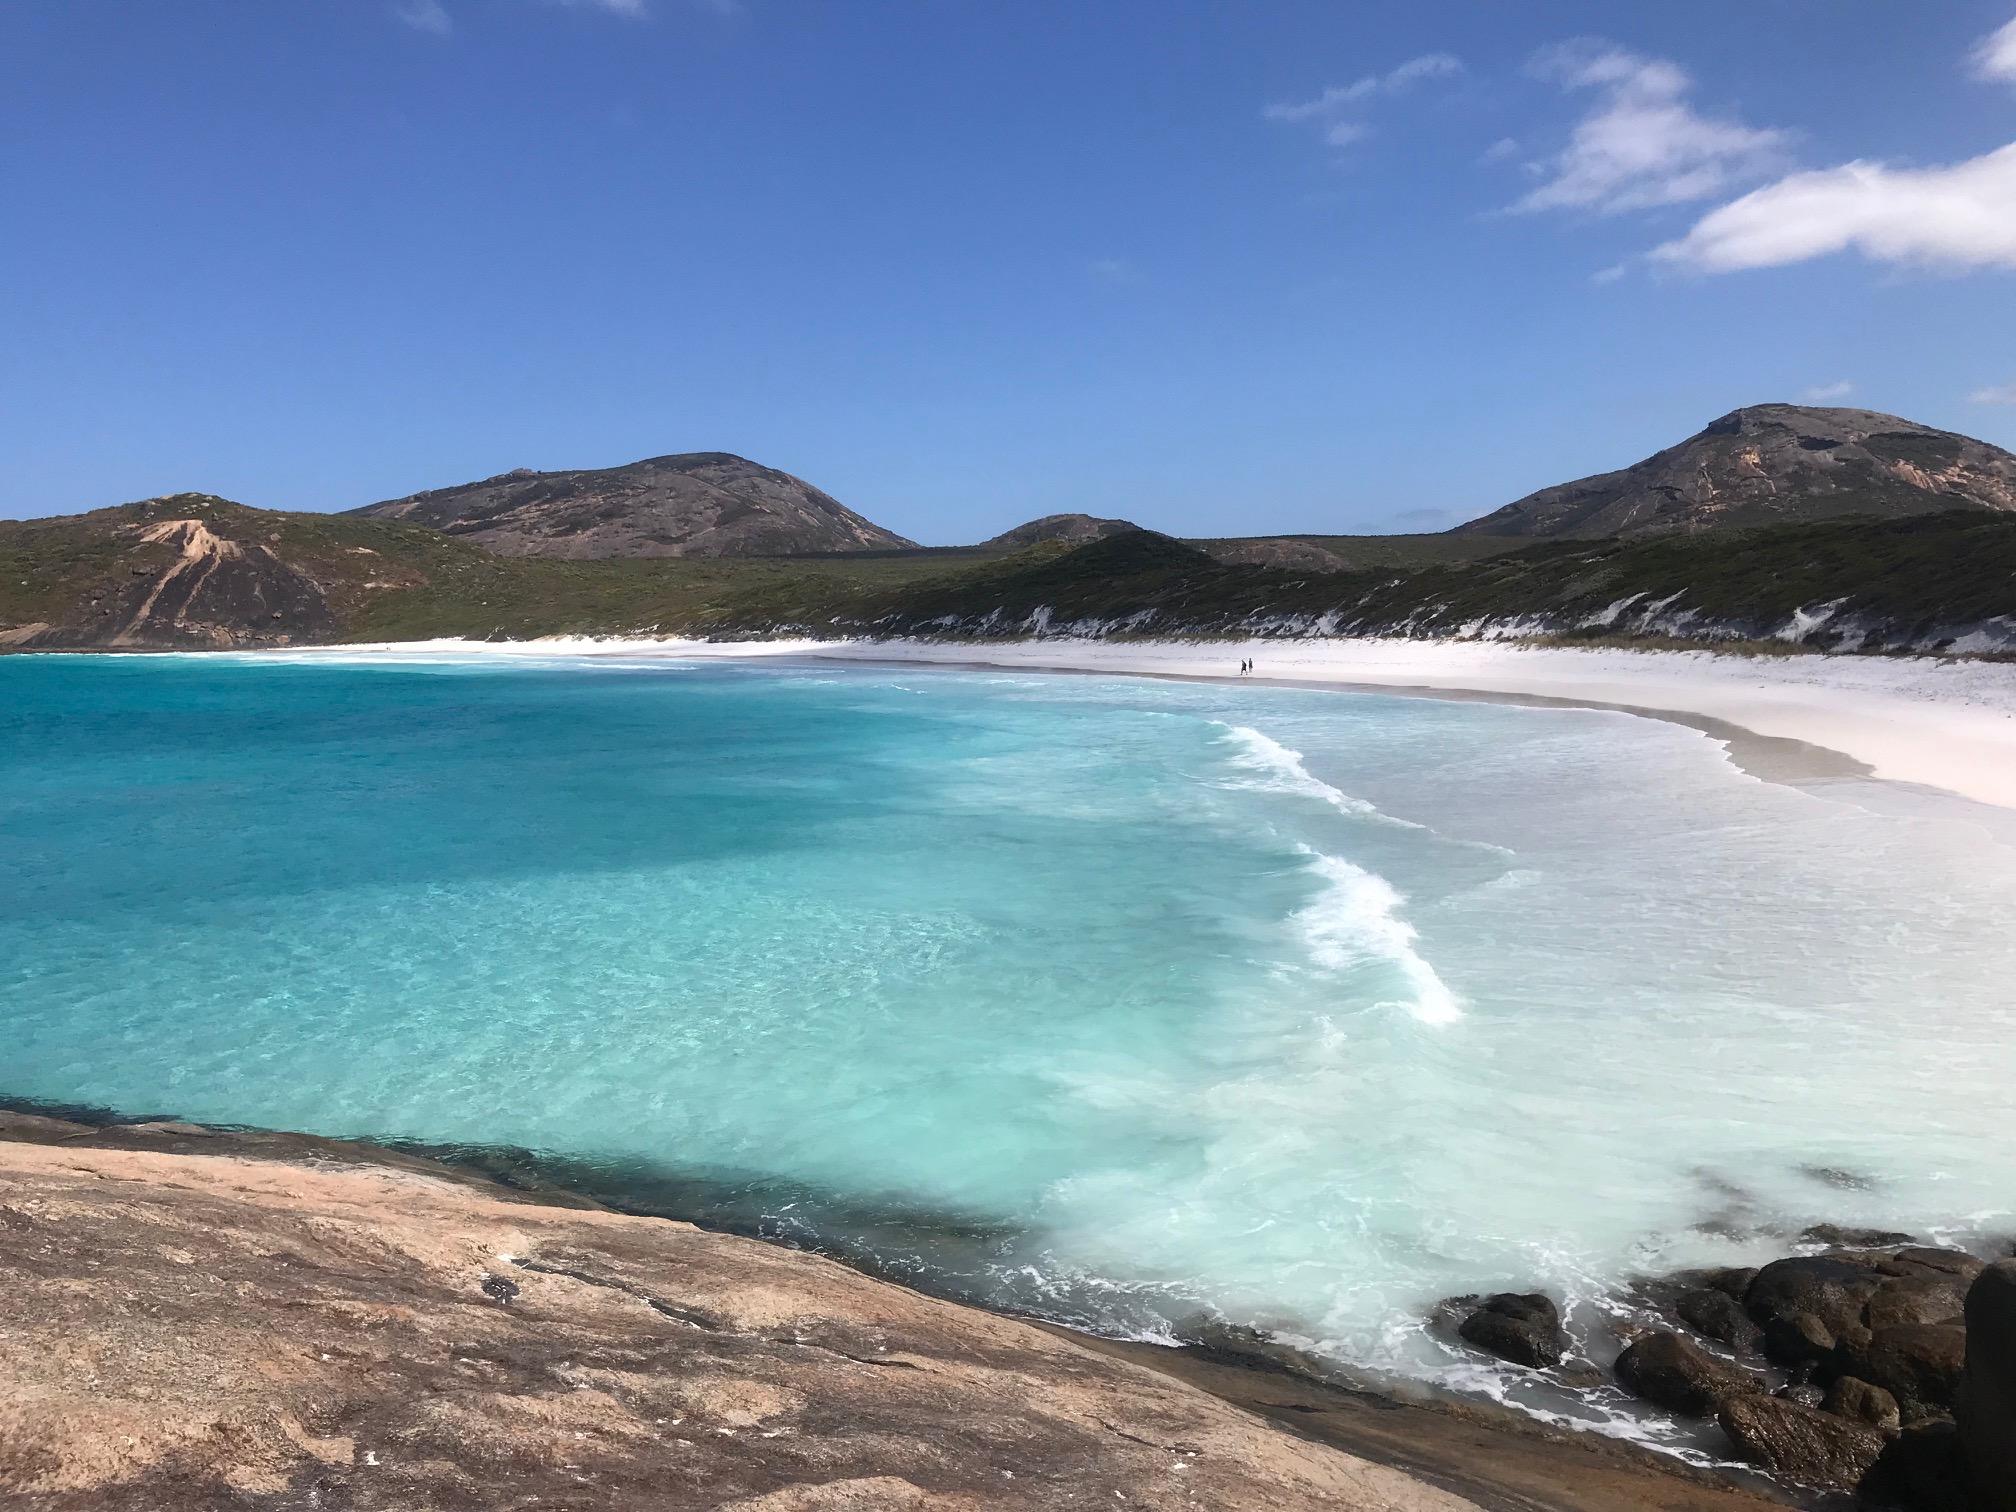 Top 5 things to do in Esperance, Australia